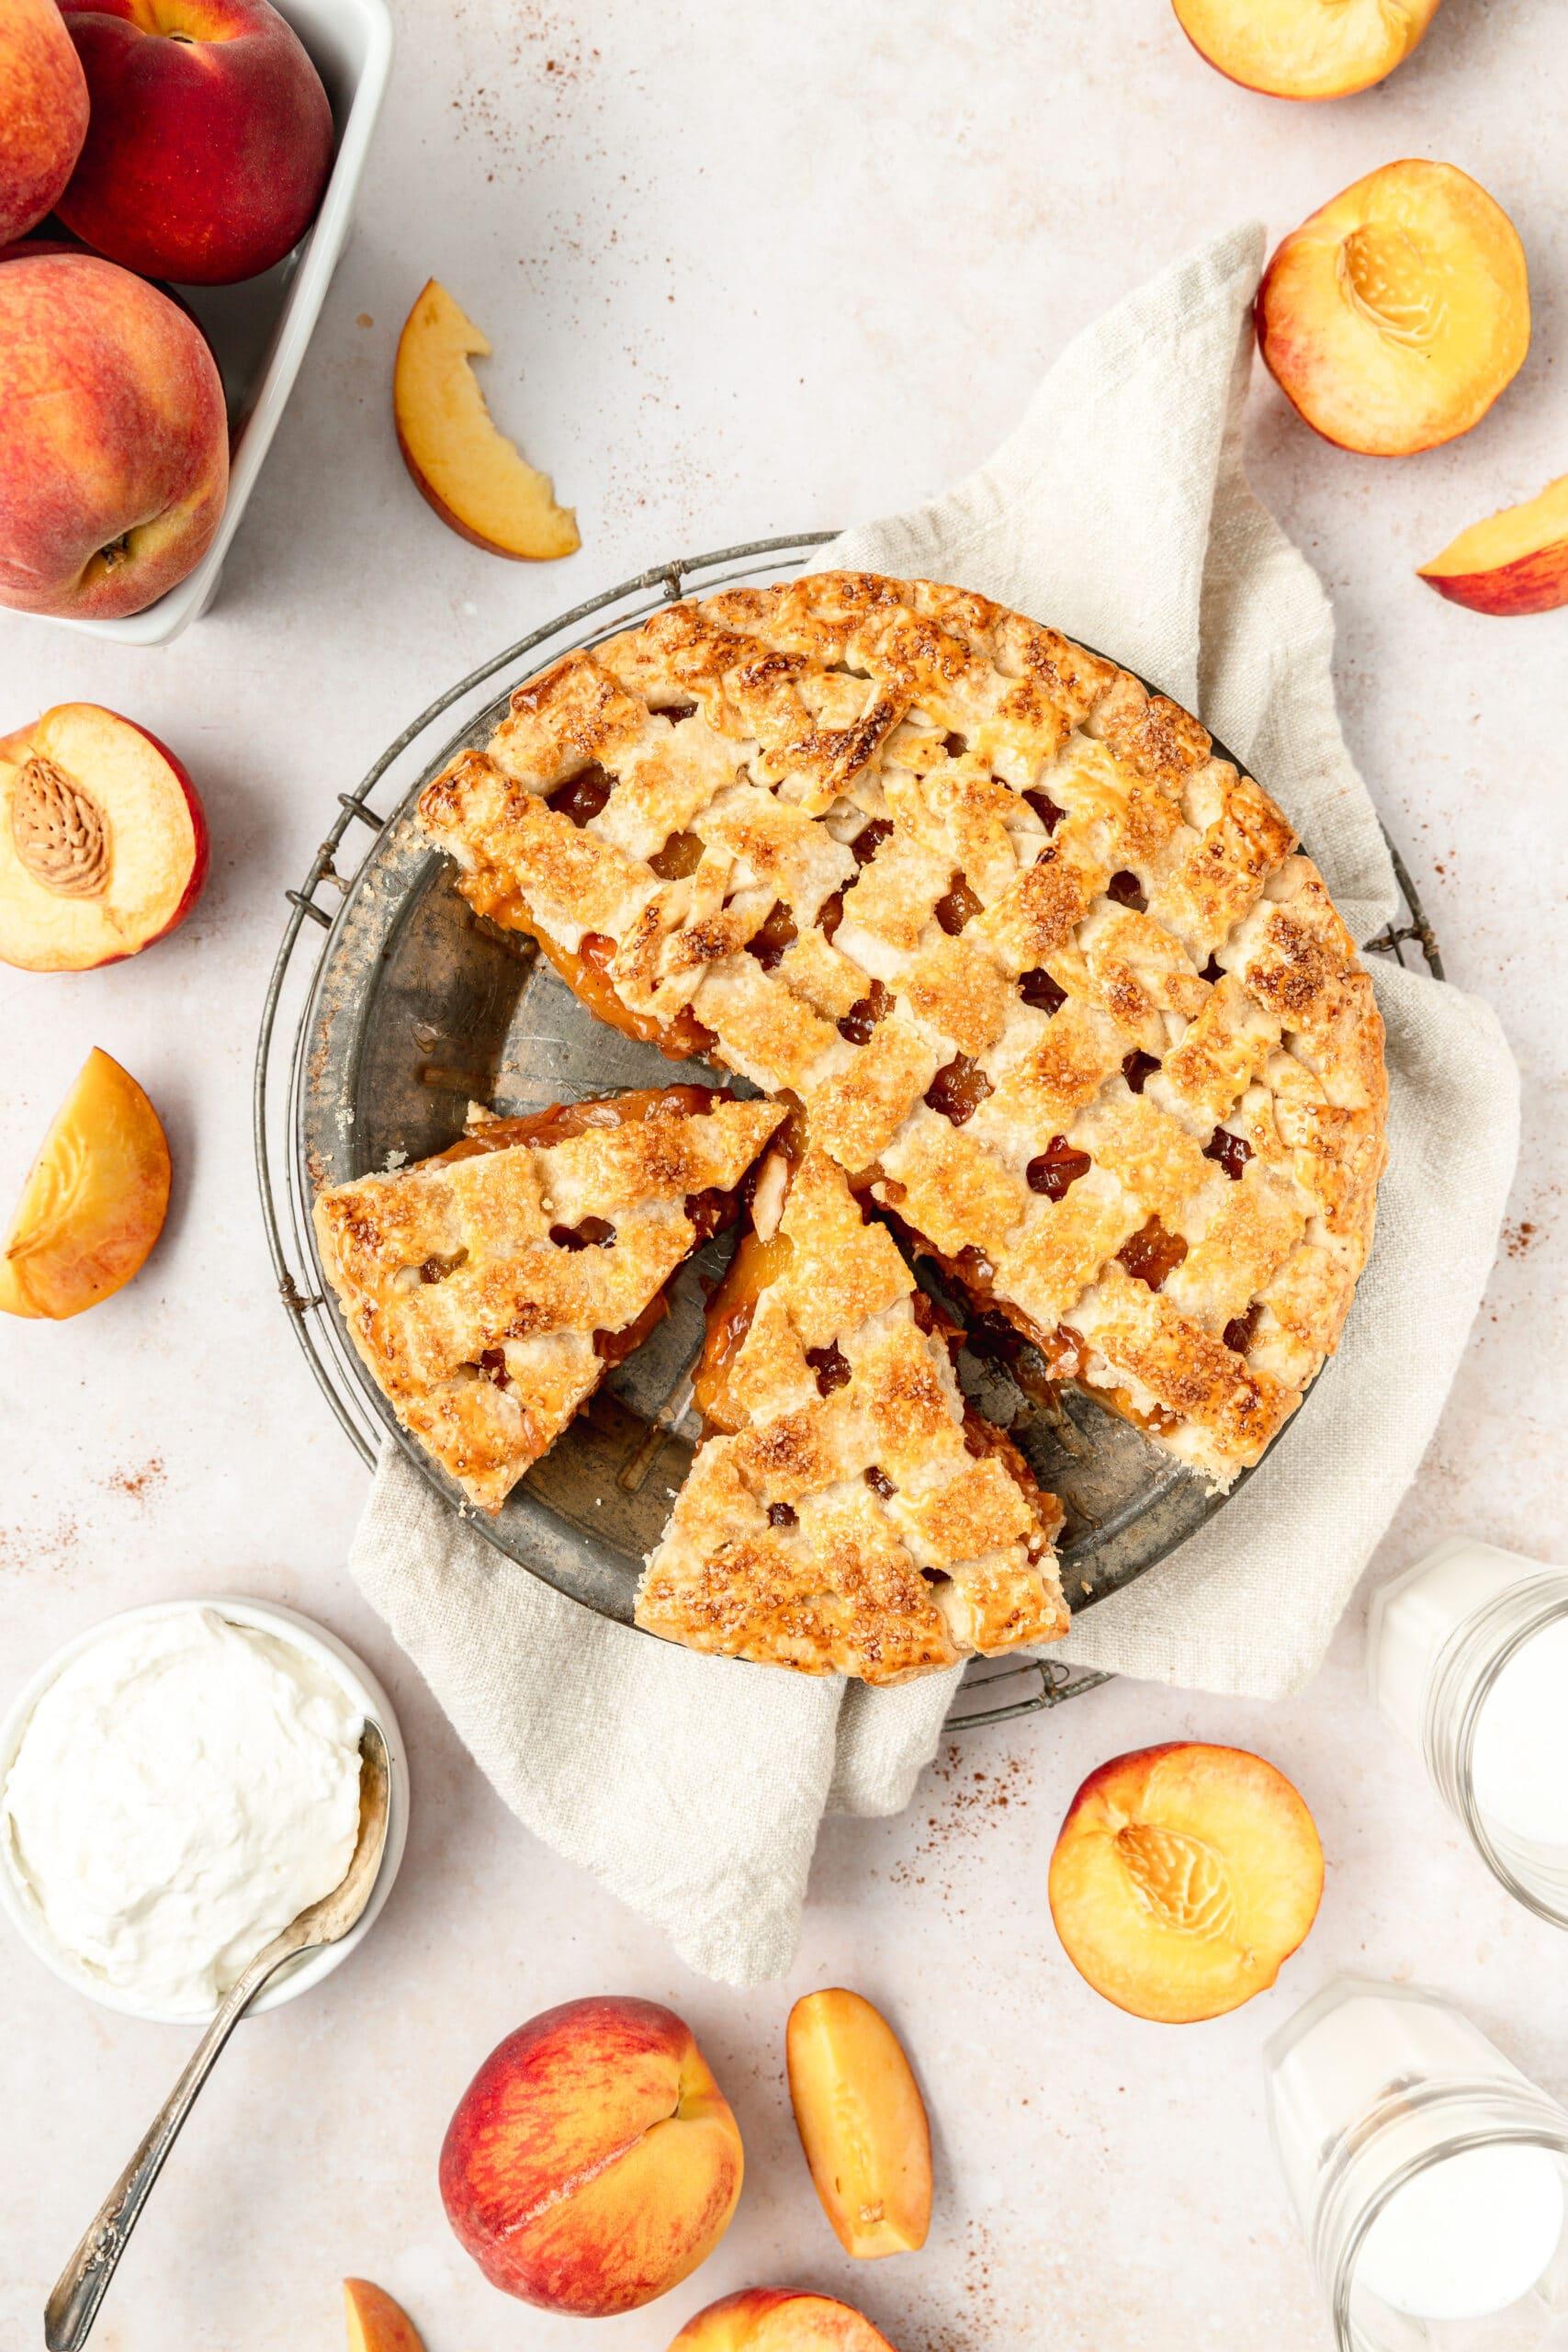 bourbon peach pie cut into slices